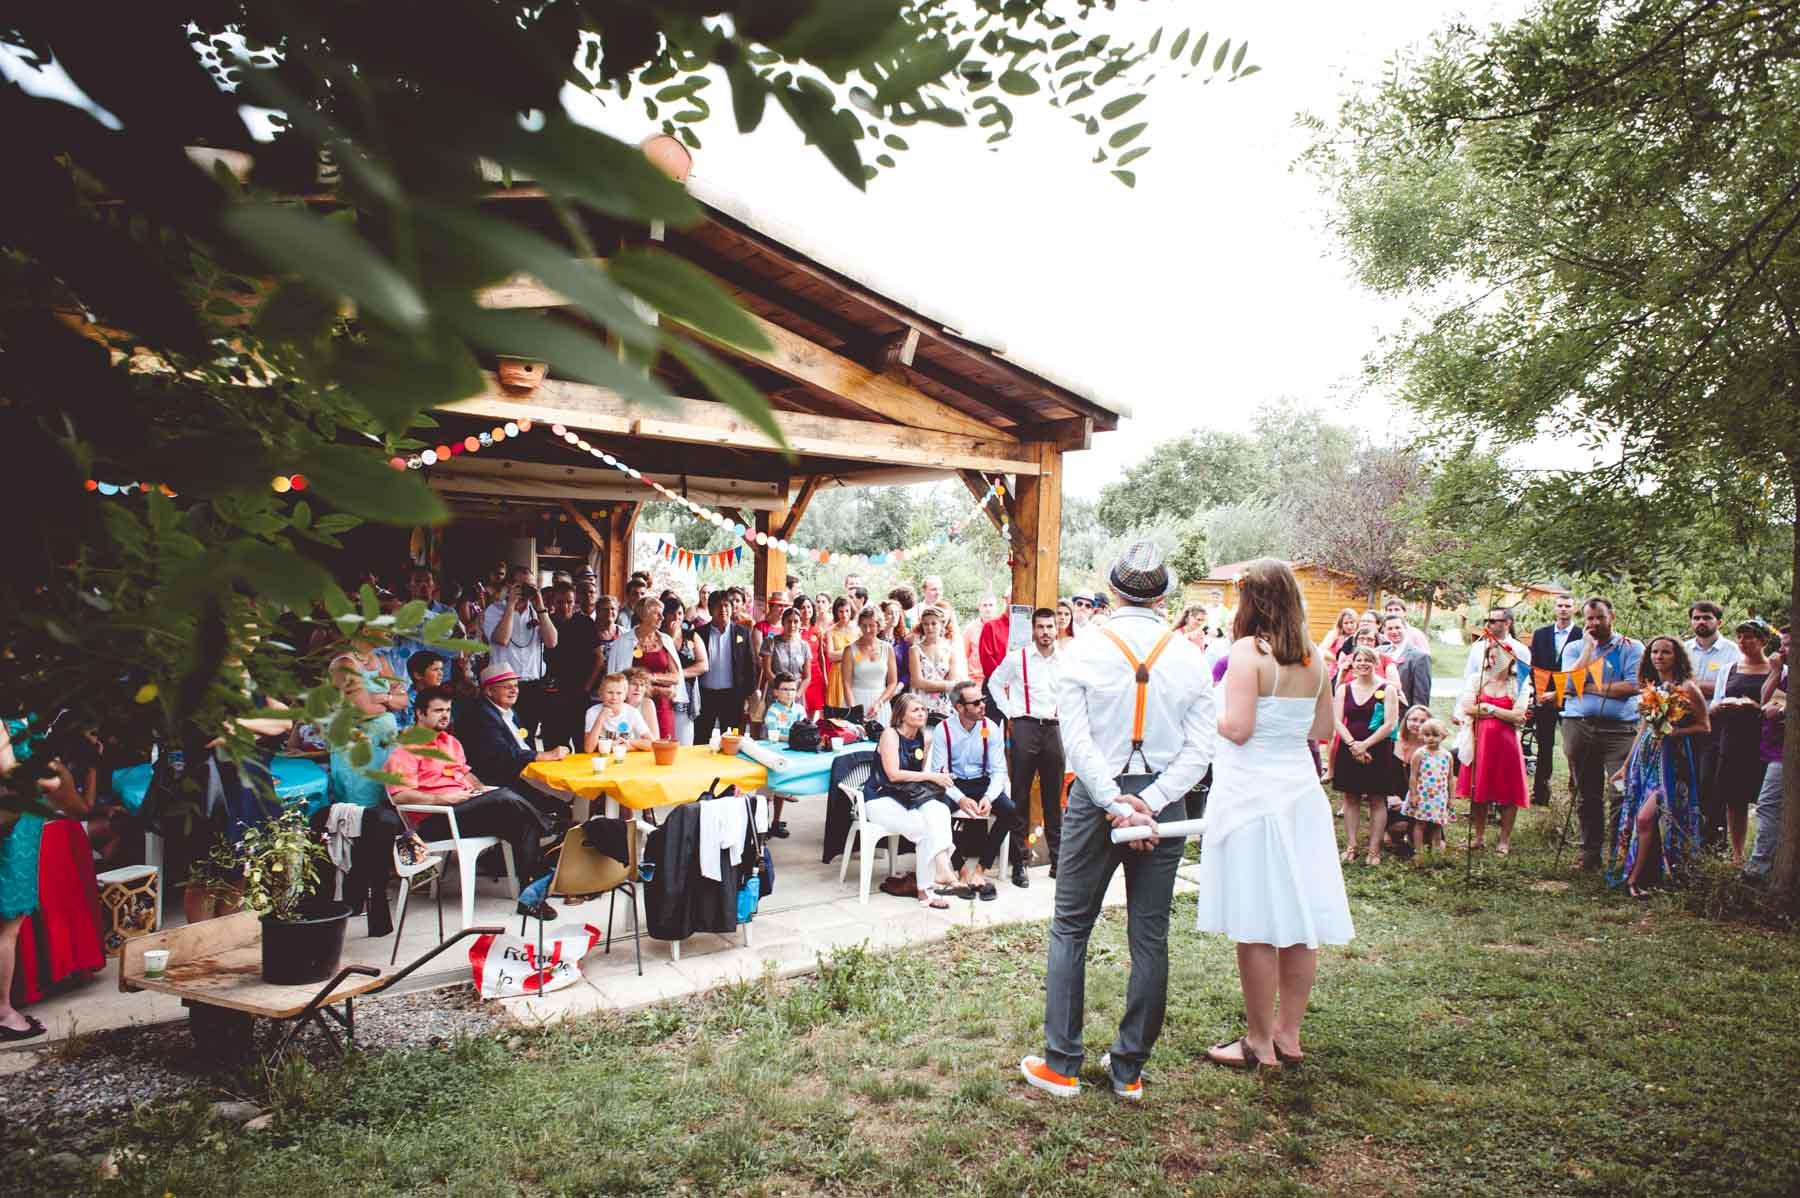 Photographe mariage original toulouse montpellier - M et S - Mademoiselle G Photographie (53)